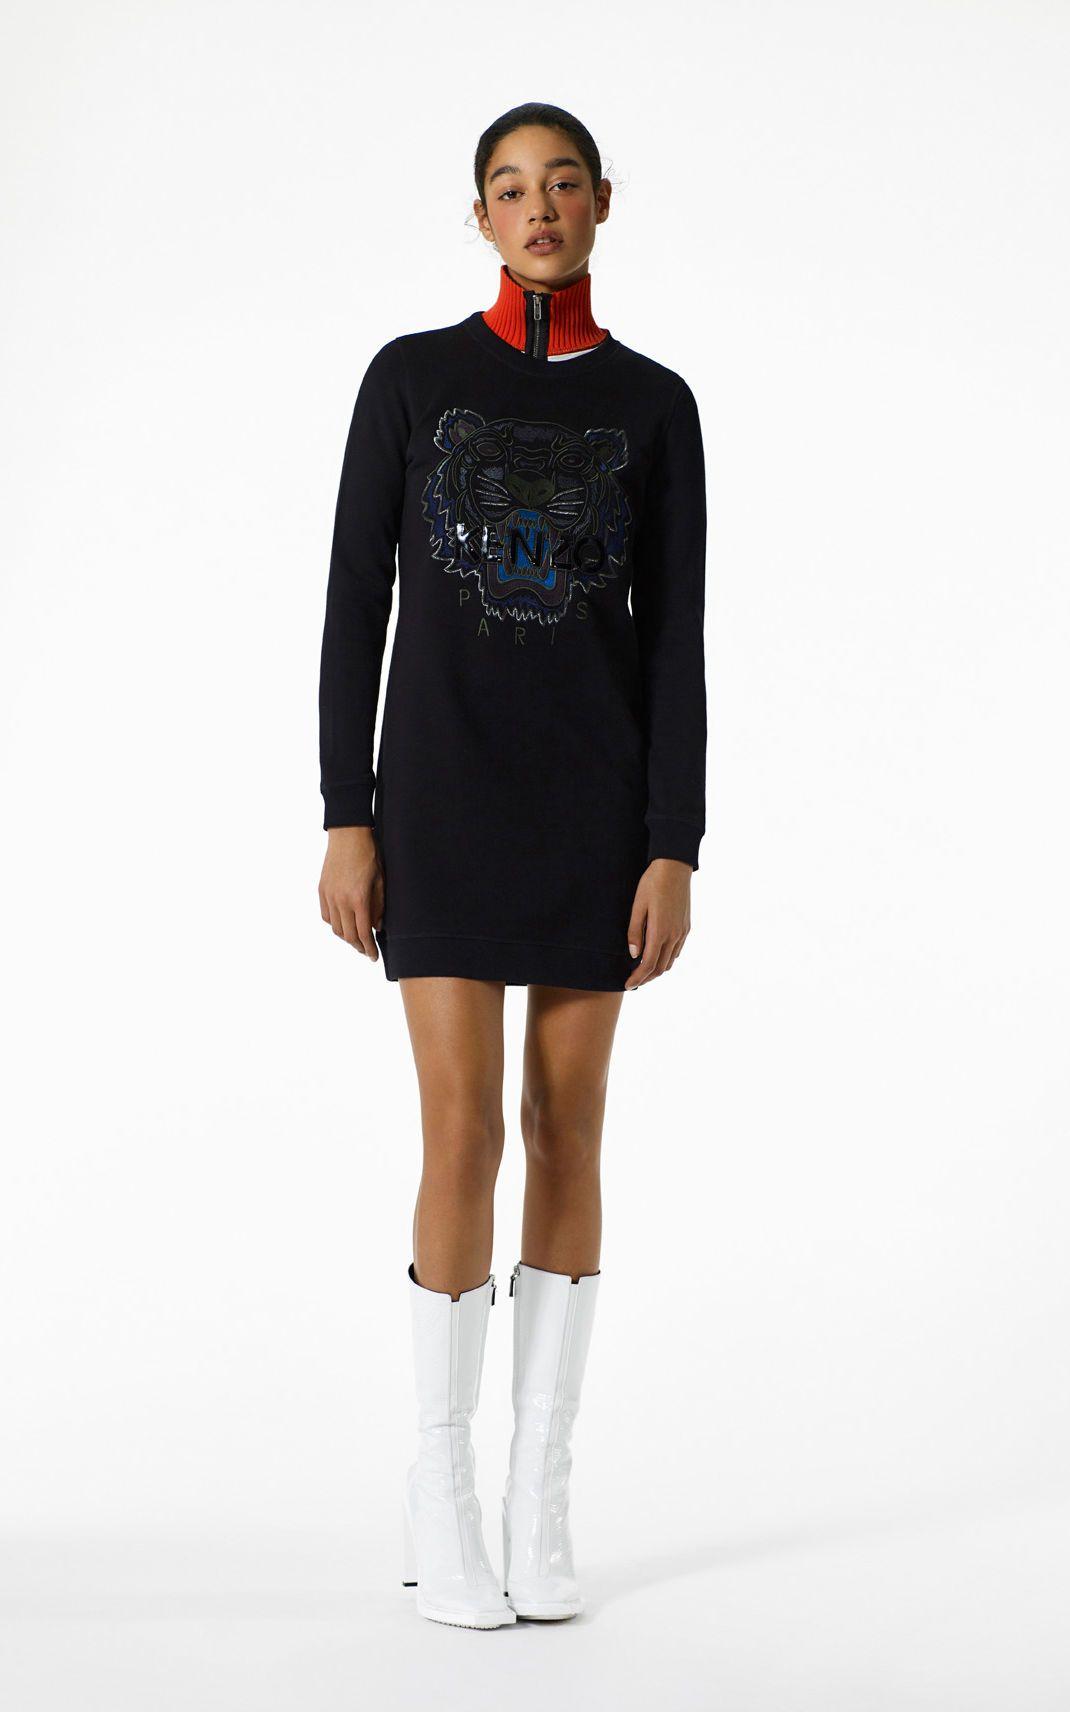 8831db39881 Tiger sweatshirt dress for Kenzo | Kenzo.com | Collect | Sweatshirt ...